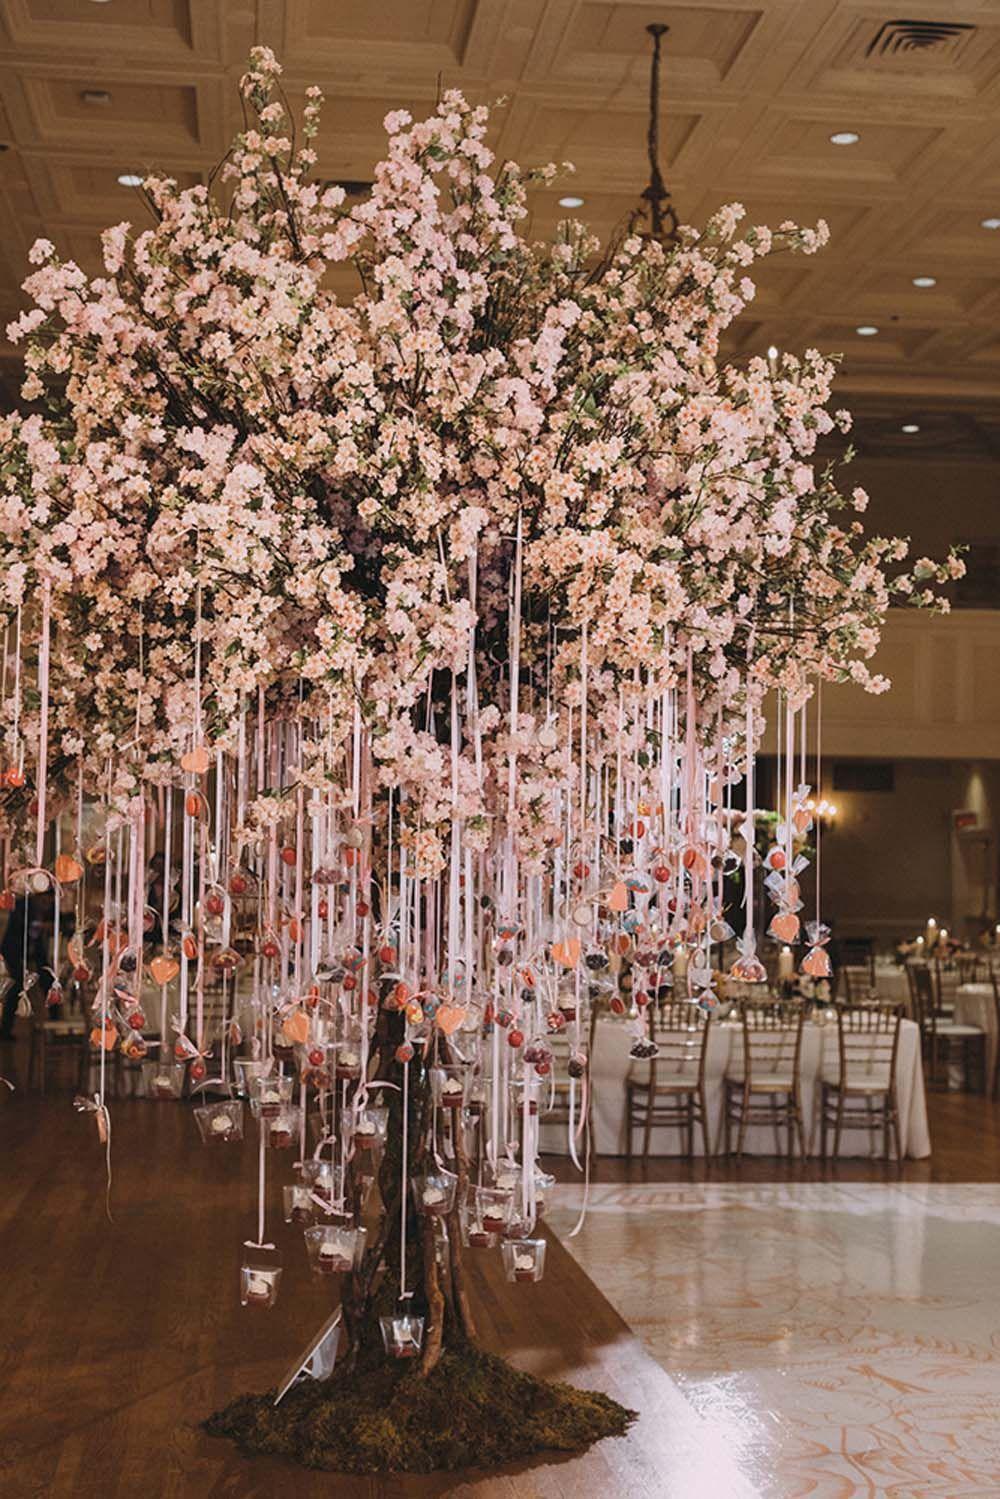 Castle Beautiful Fairytale Wedding Ceremony Blossom Tree Wedding Cherry Blossom Wedding Cherry Blossom Theme